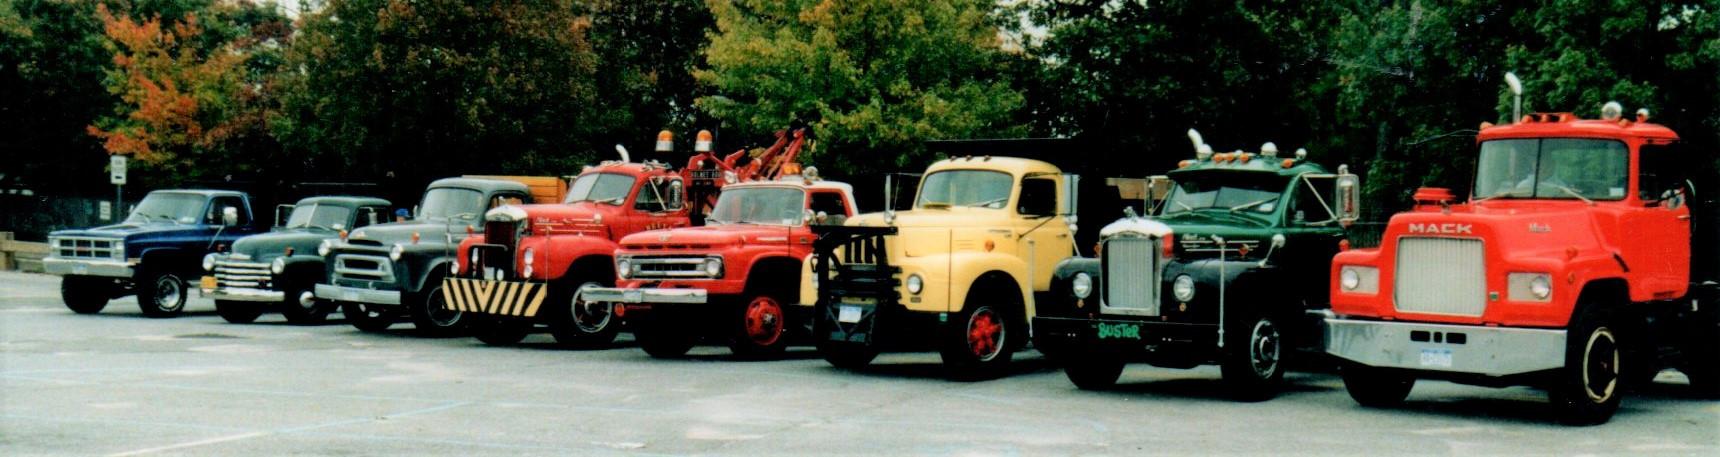 Member's truckson the run